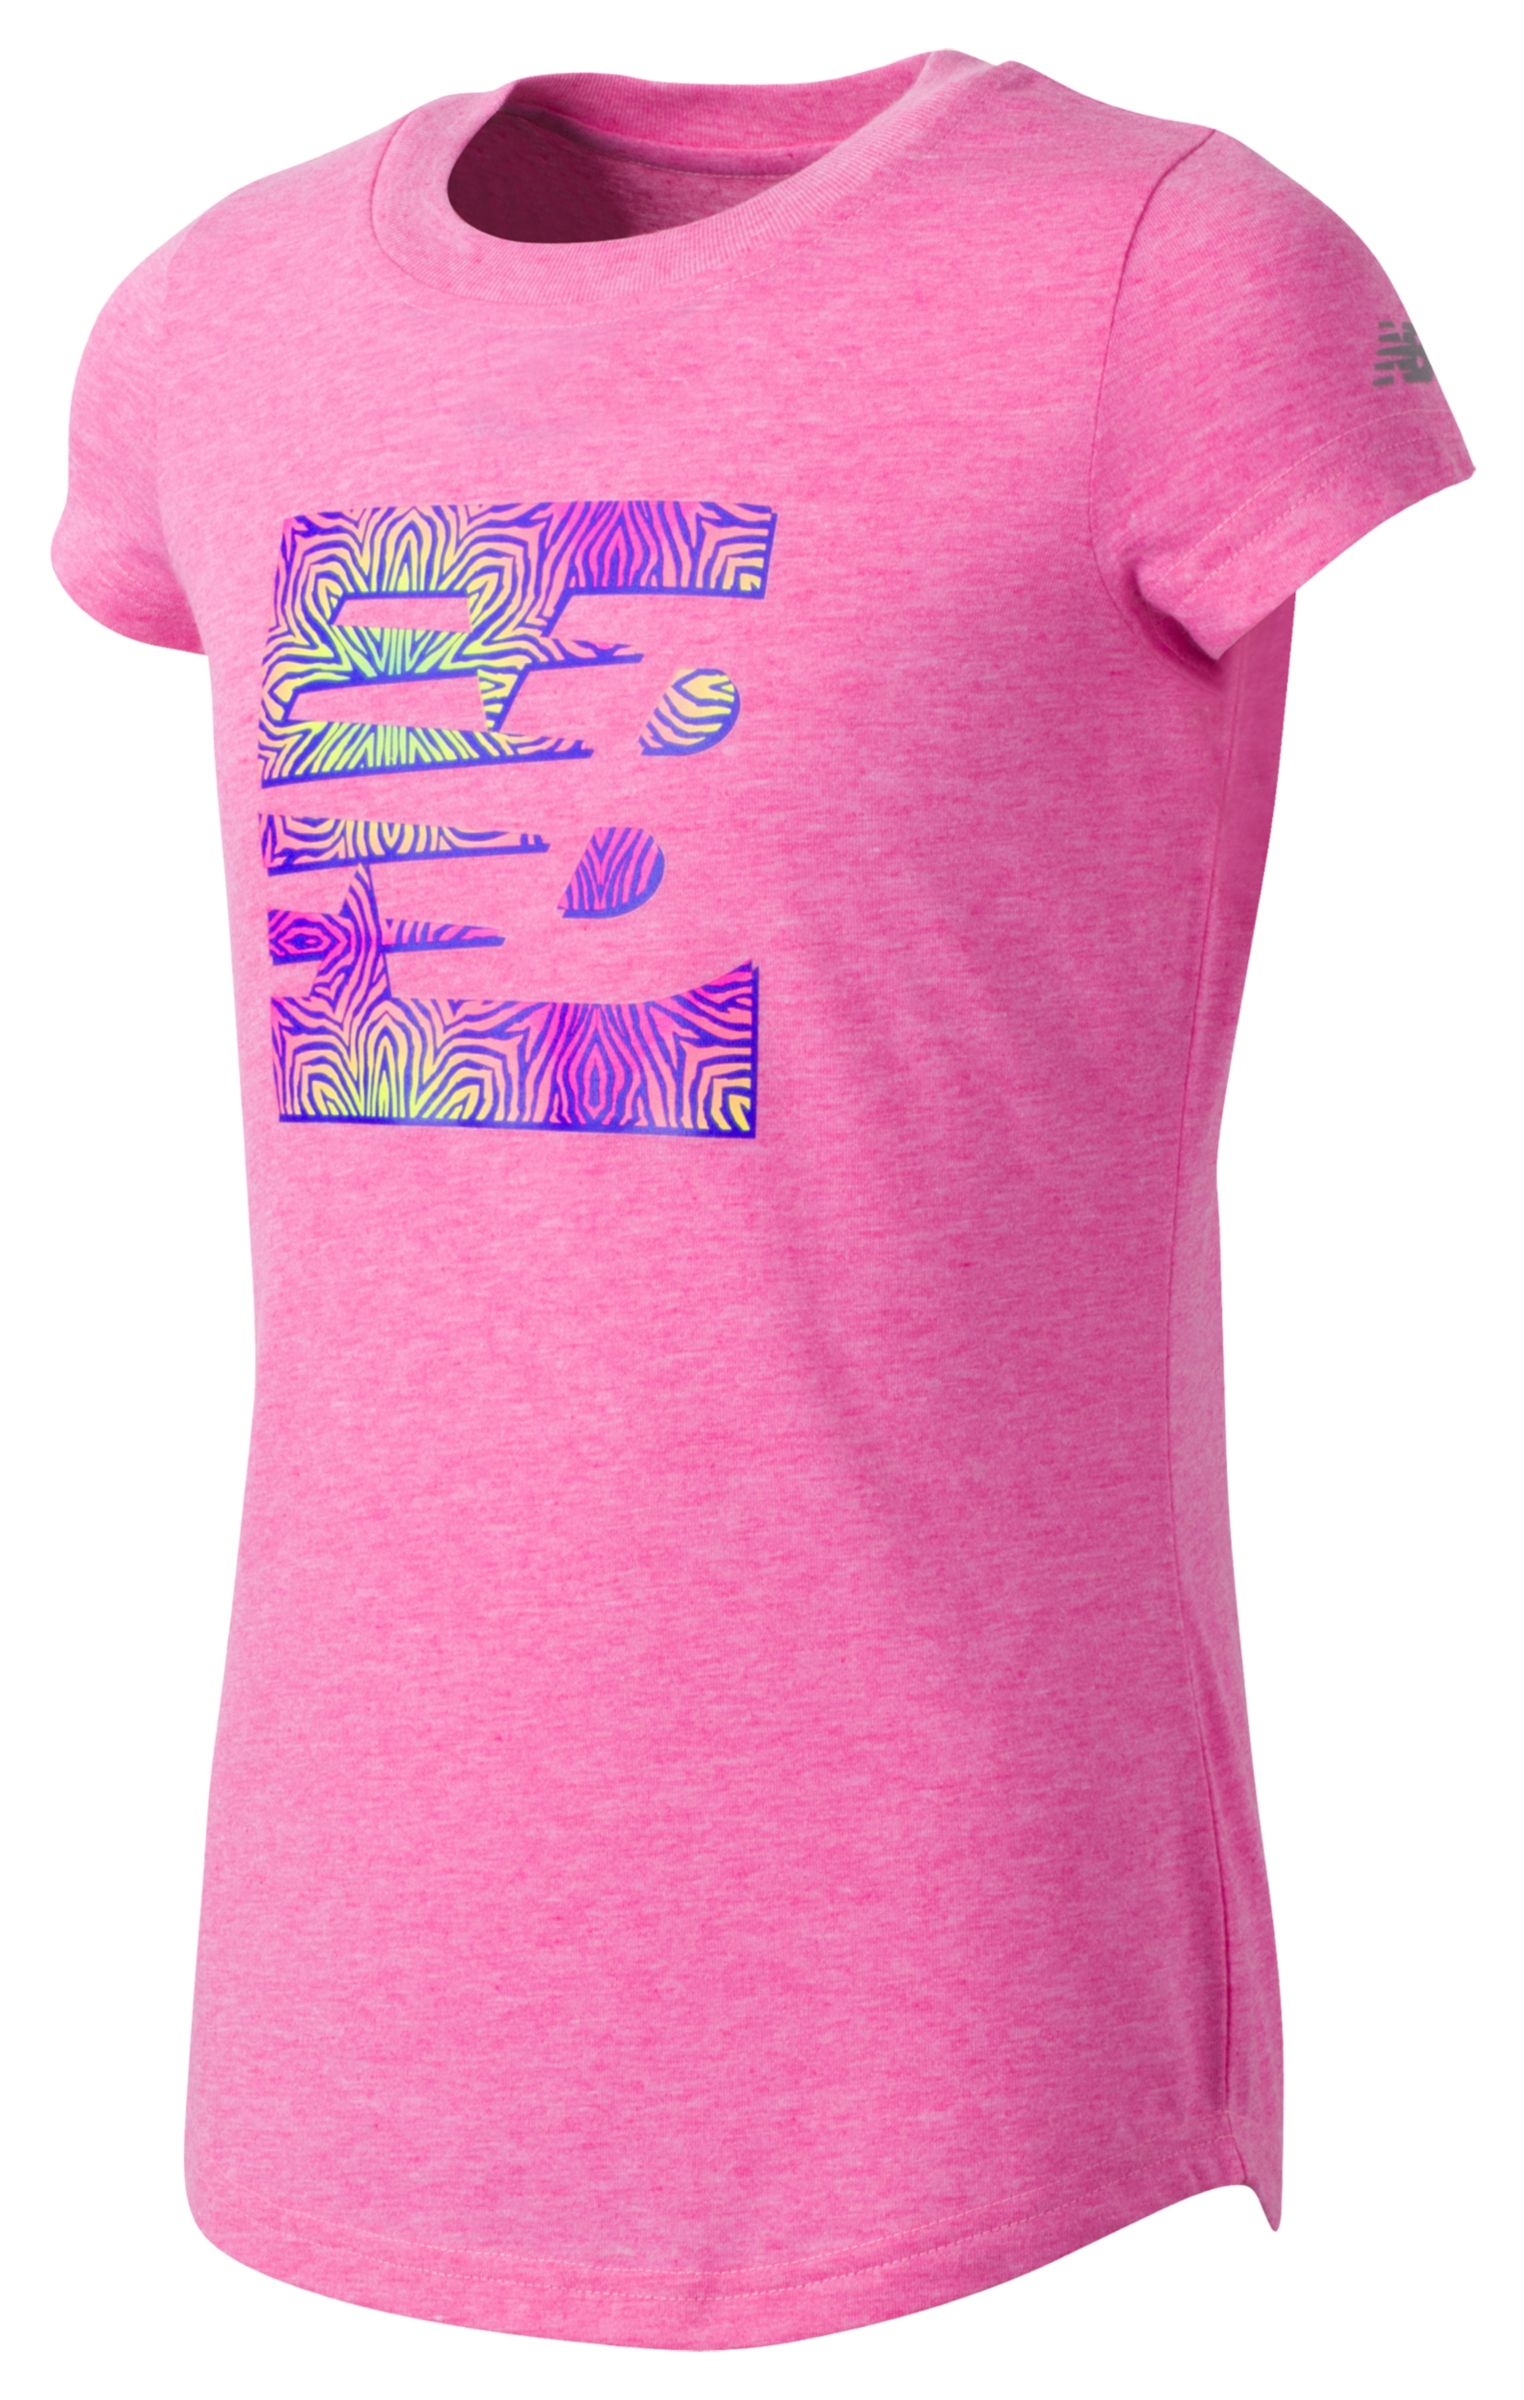 New Balance Girls Short Sleeve Graphic Tee Pink